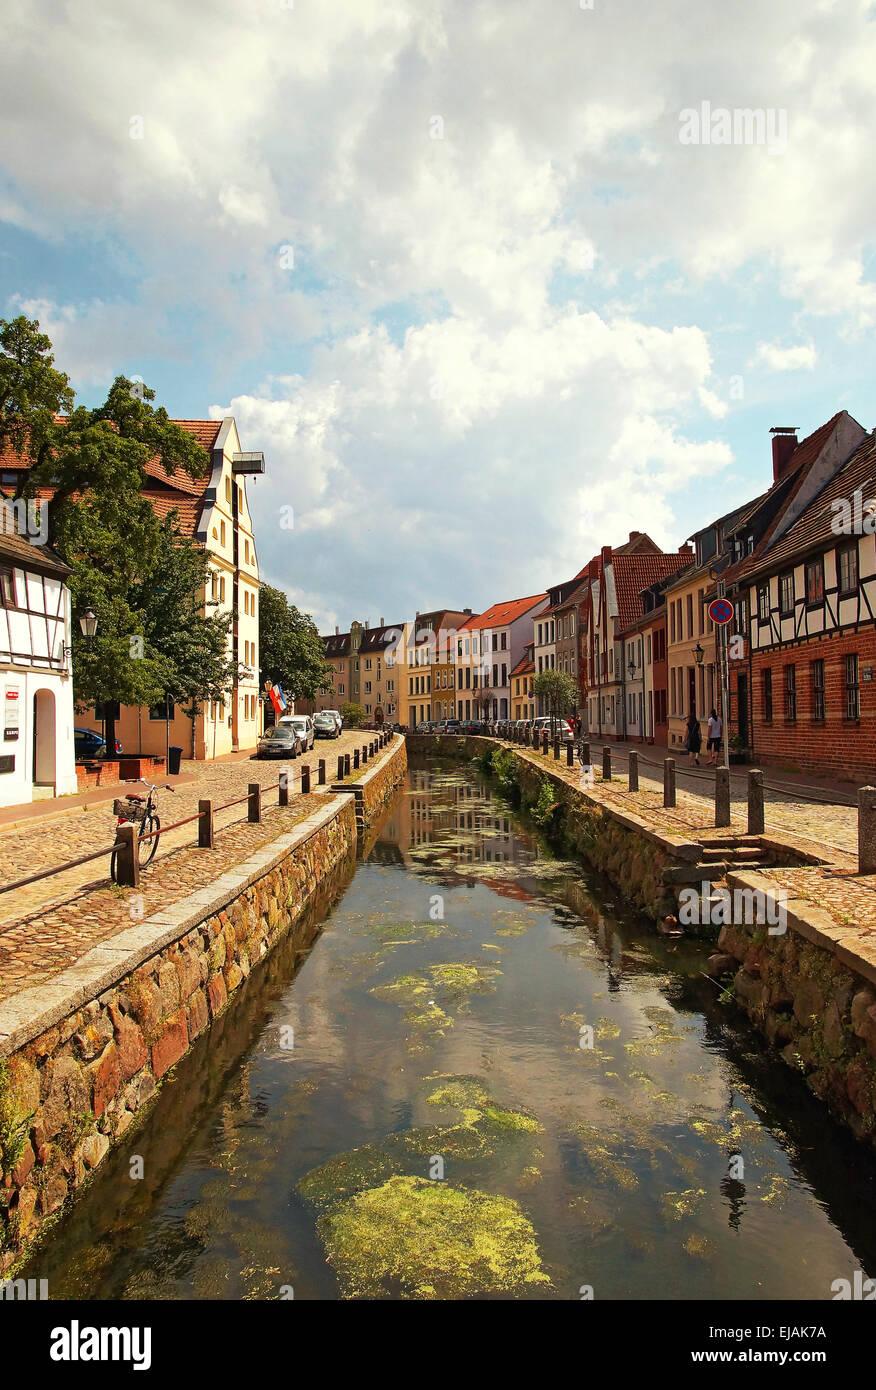 Hanseatic City Wismar Germany - Stock Image